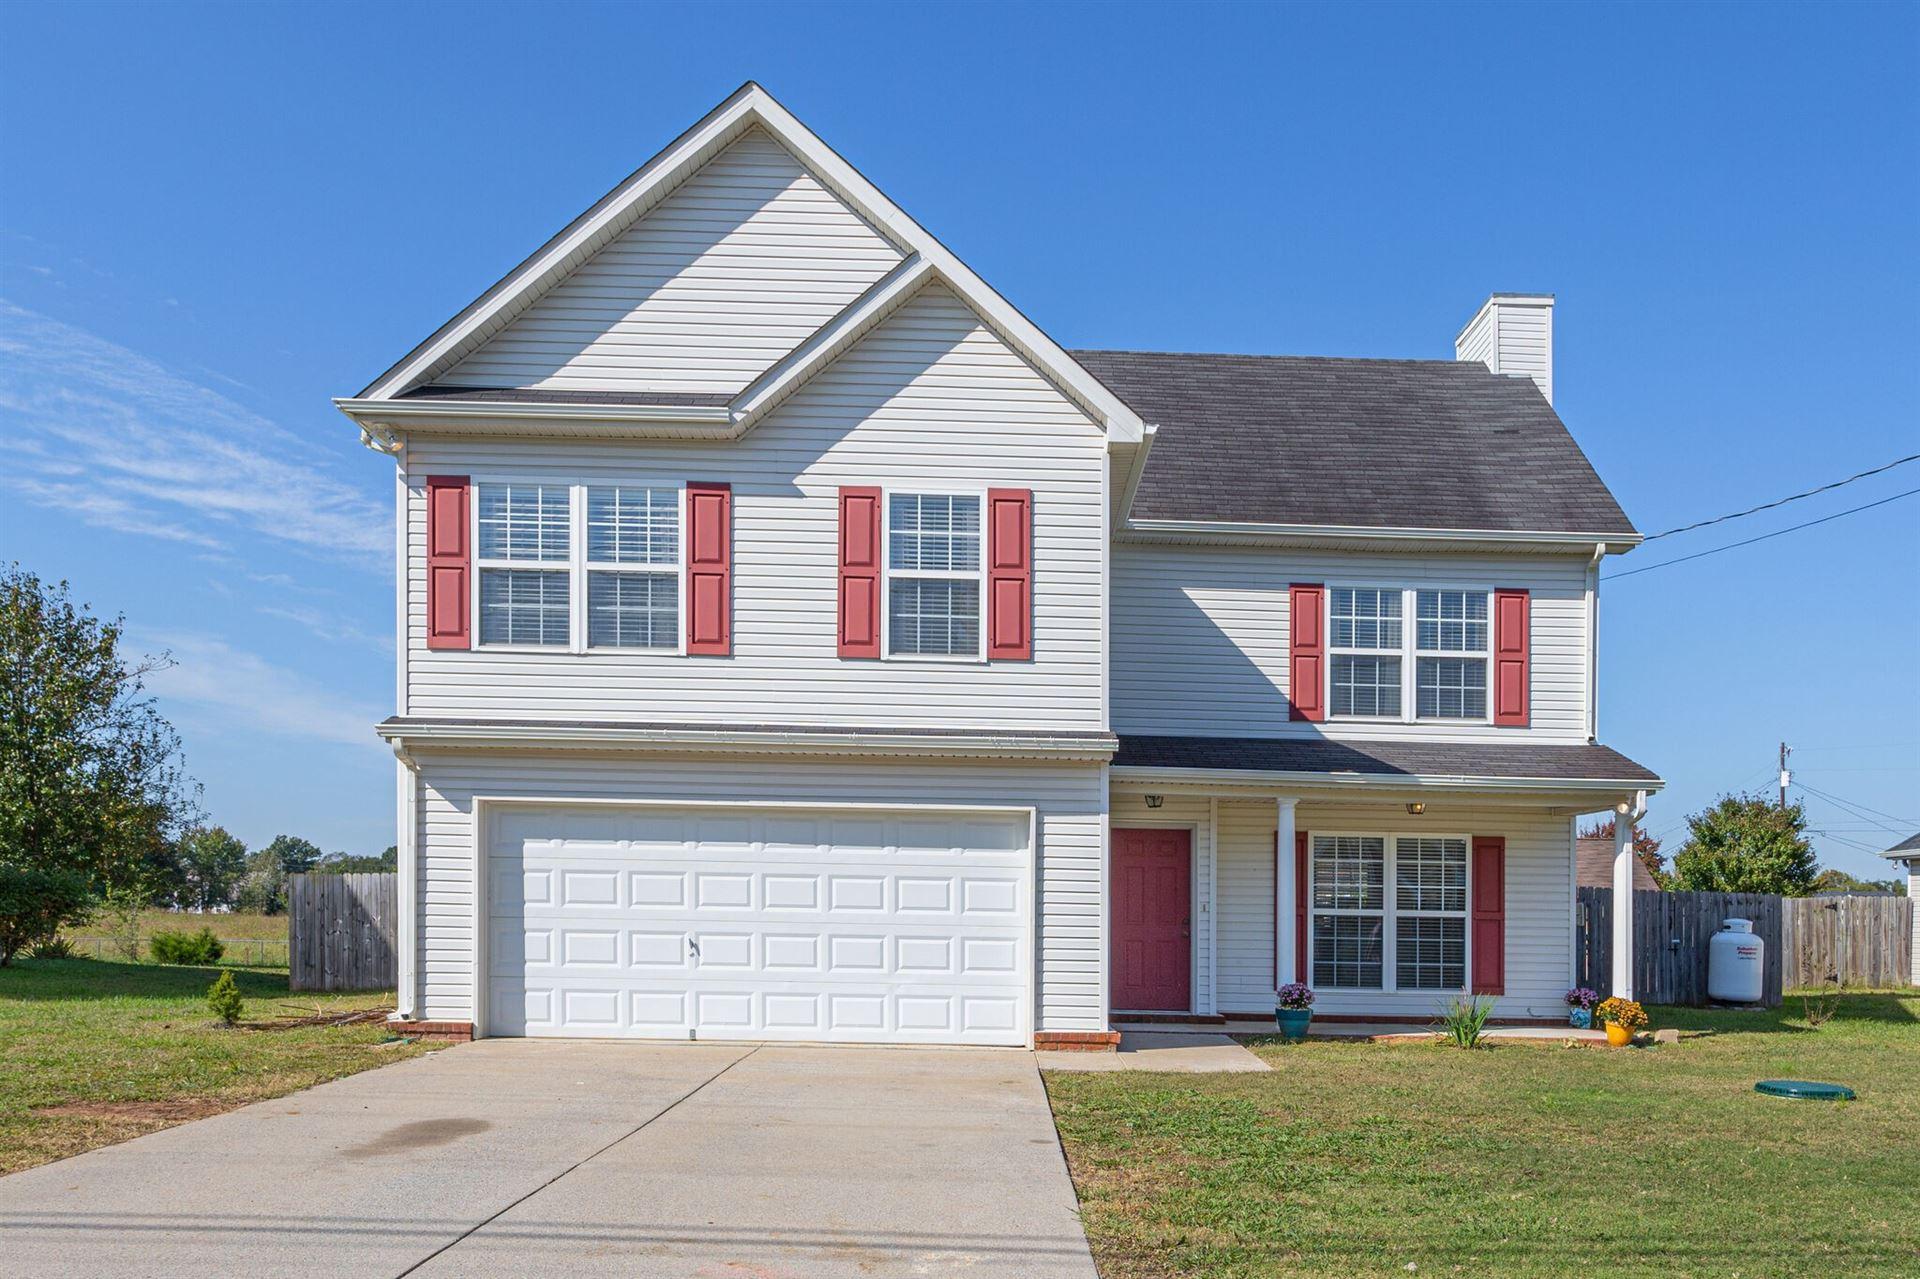 646 Fleming Farms Dr, Murfreesboro, TN 37128 - MLS#: 2302522